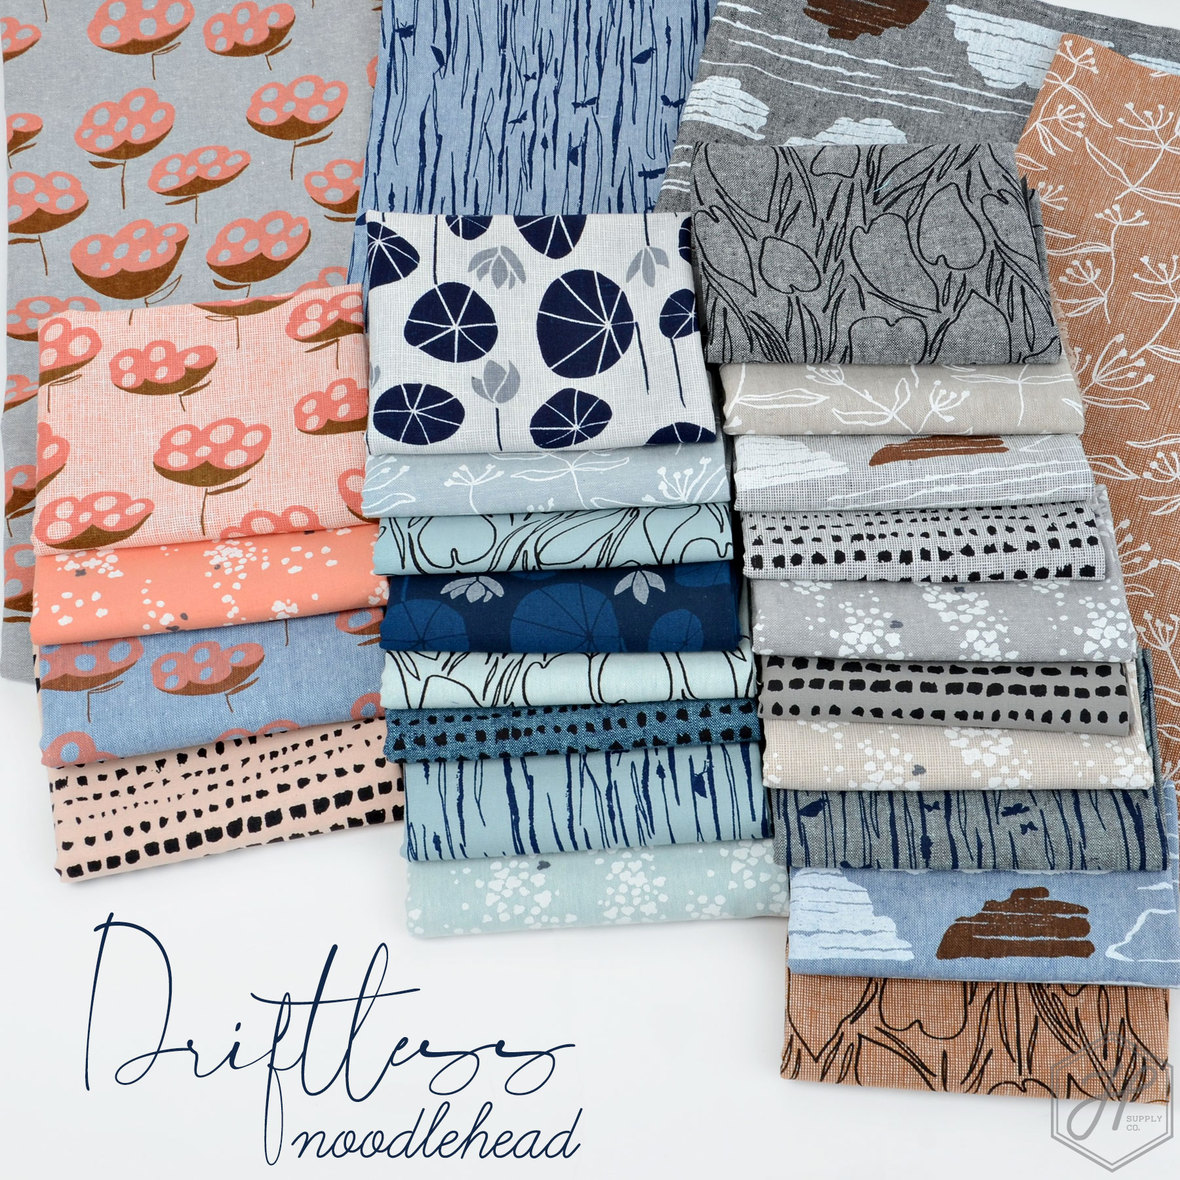 Driftless-fabric-Noodlehead-for-Robert-Kaufman-at-Hawthorne-Supply-co